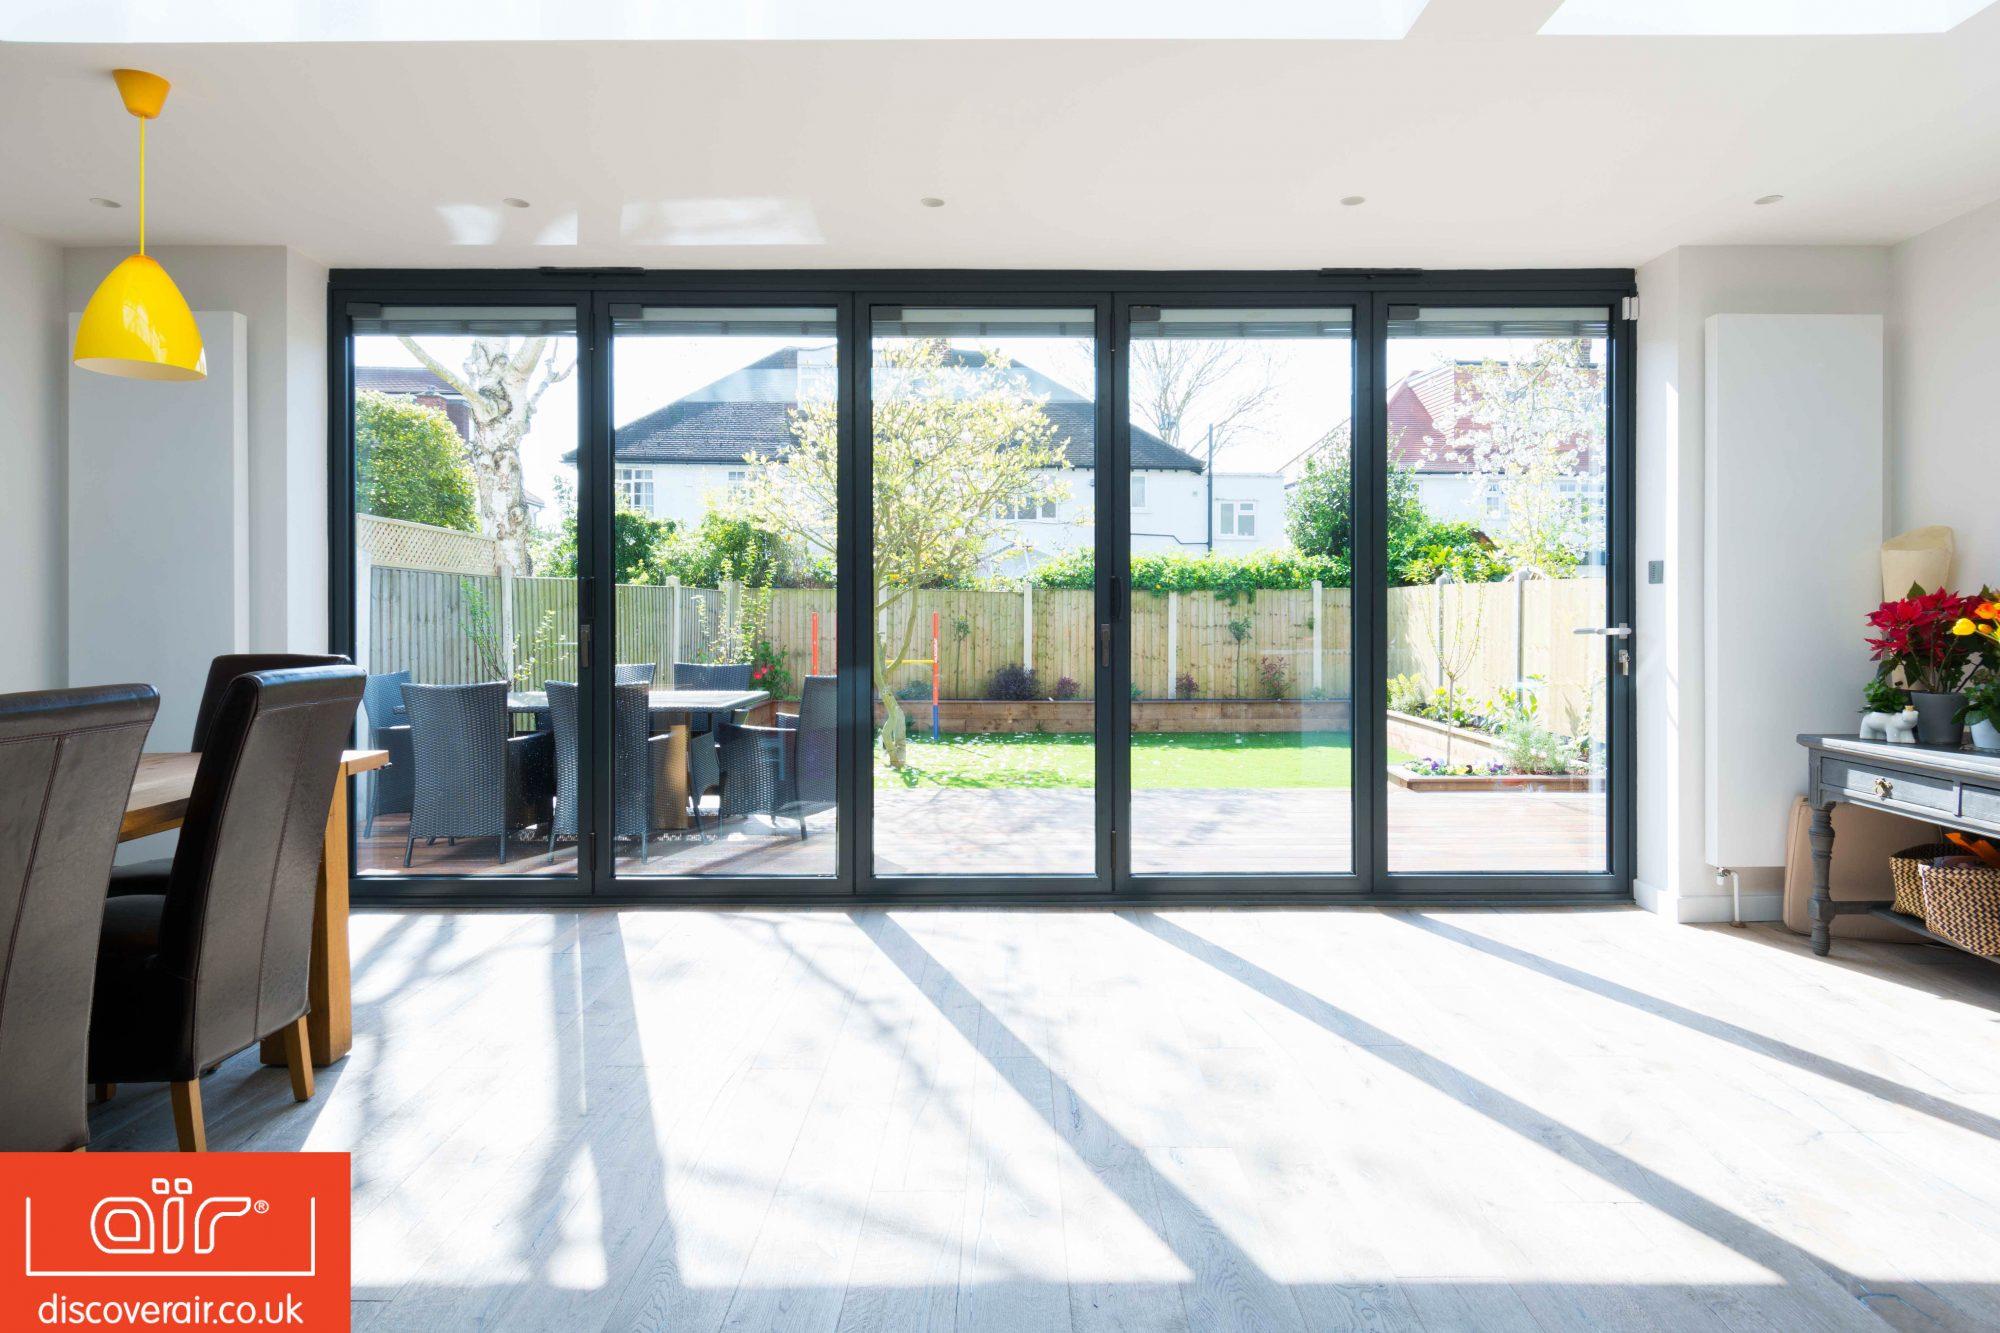 aïr bi-fold doors from Everglade, Perivale